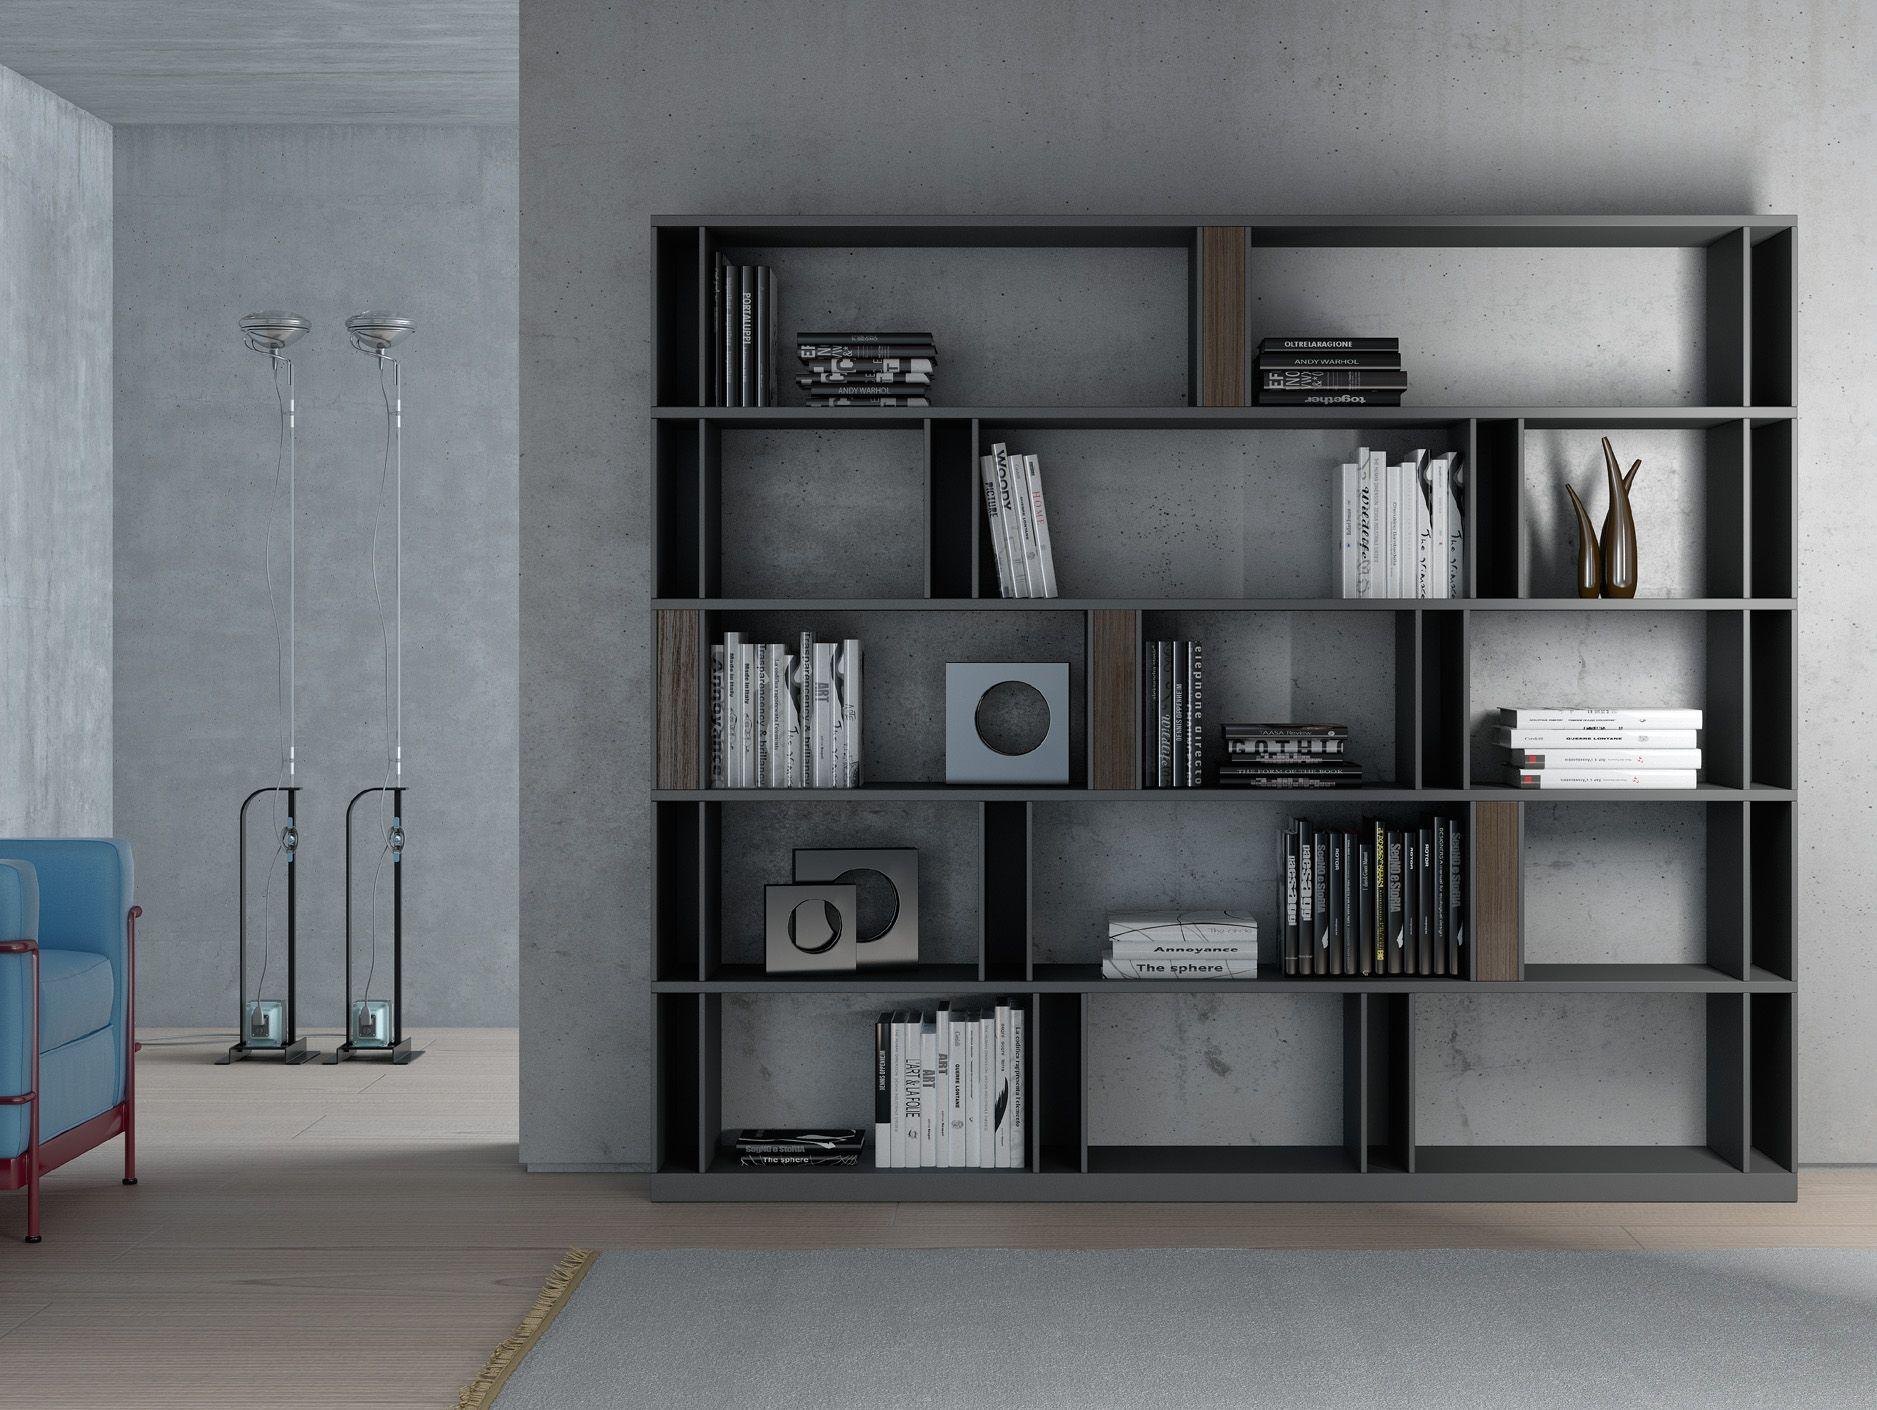 brera librari pinterest regal regalsystem und design. Black Bedroom Furniture Sets. Home Design Ideas